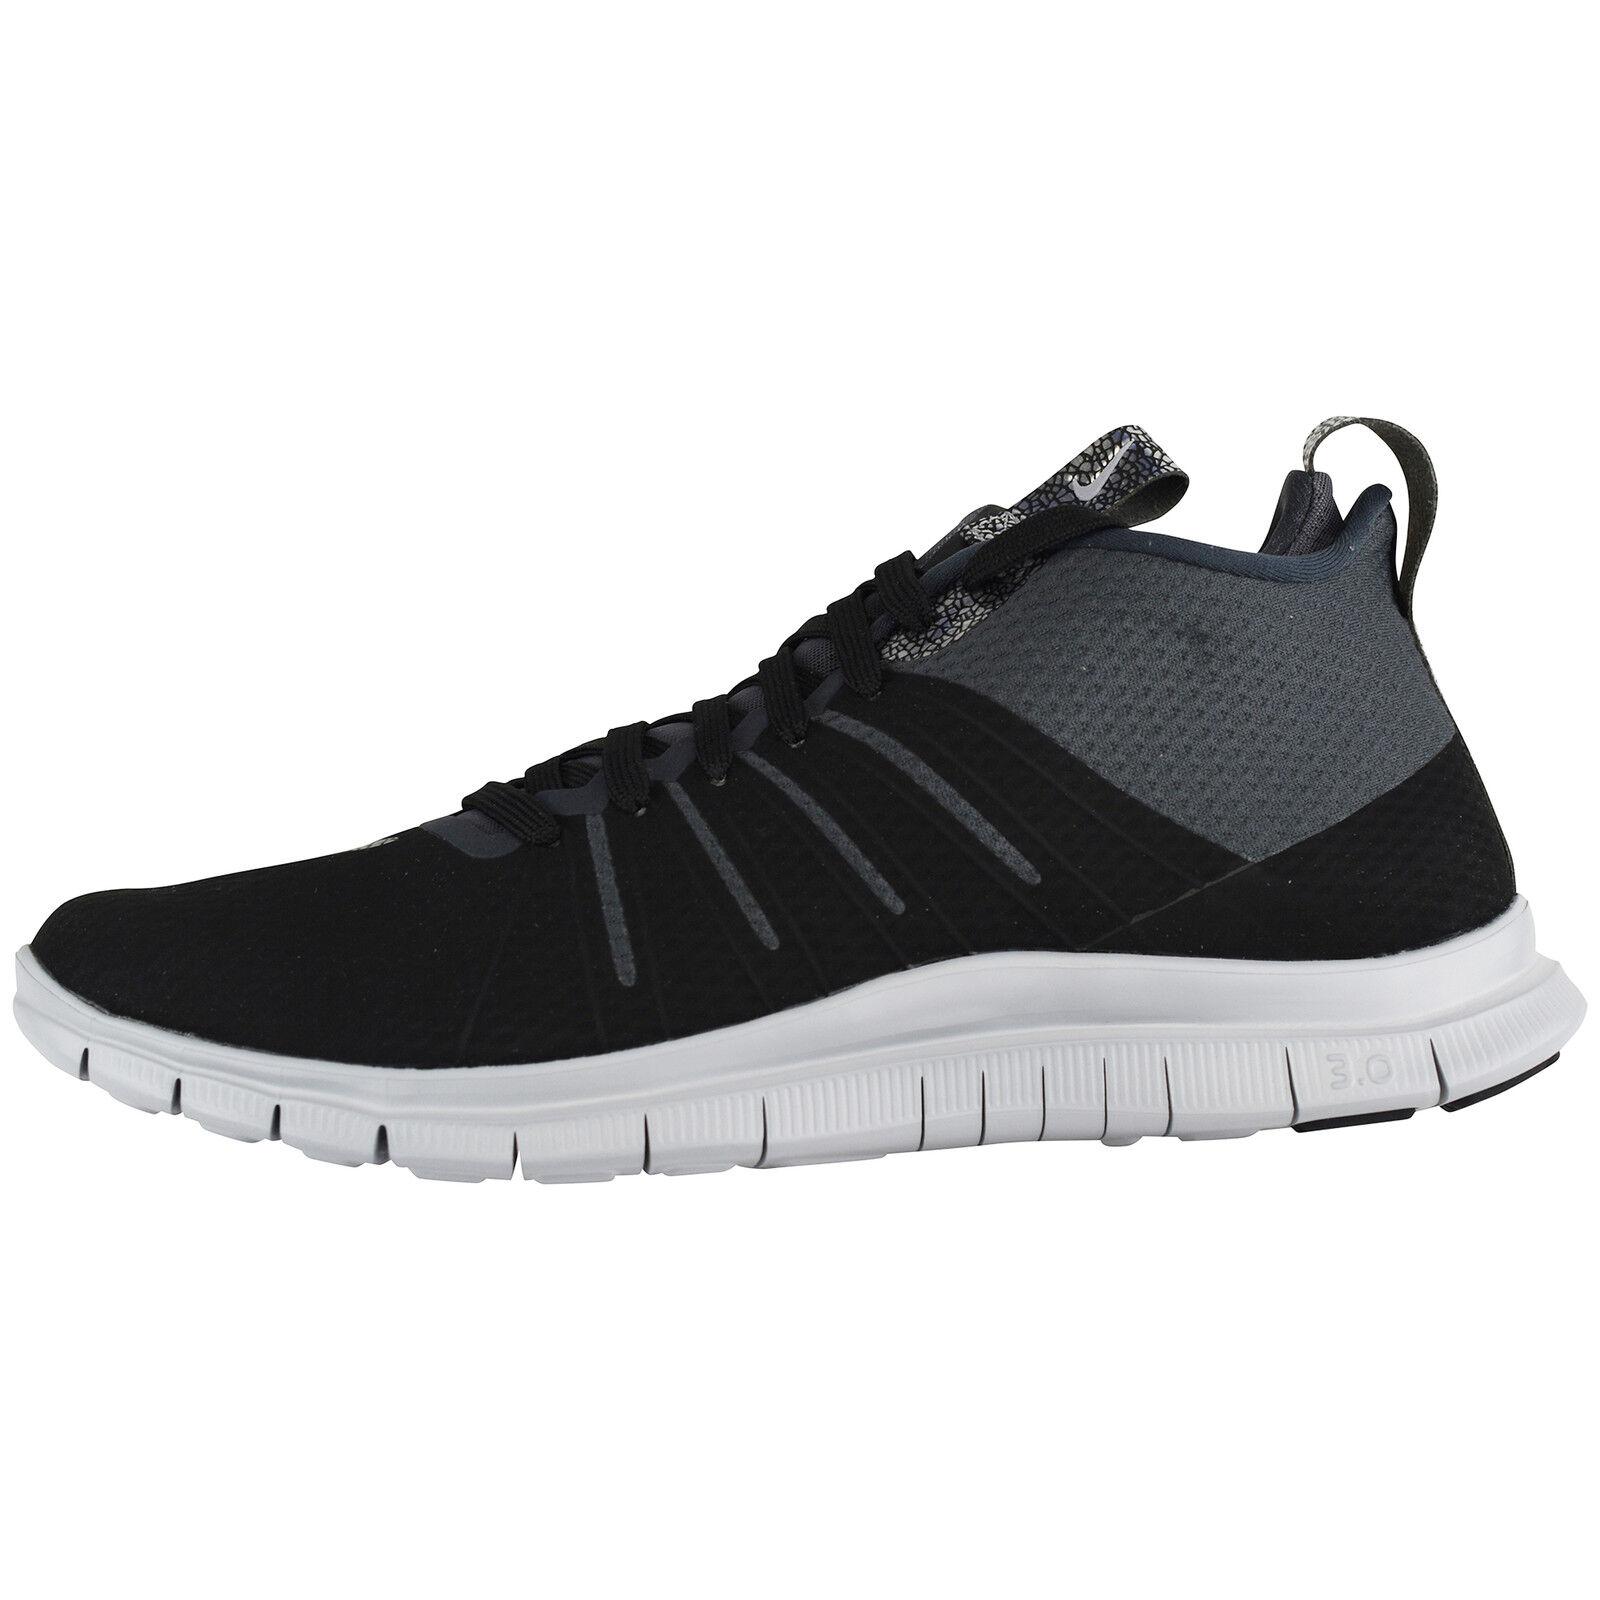 Nike Free Hypervenom 2 FS 805890-002 Lifestyle Running Leisure Running shoes